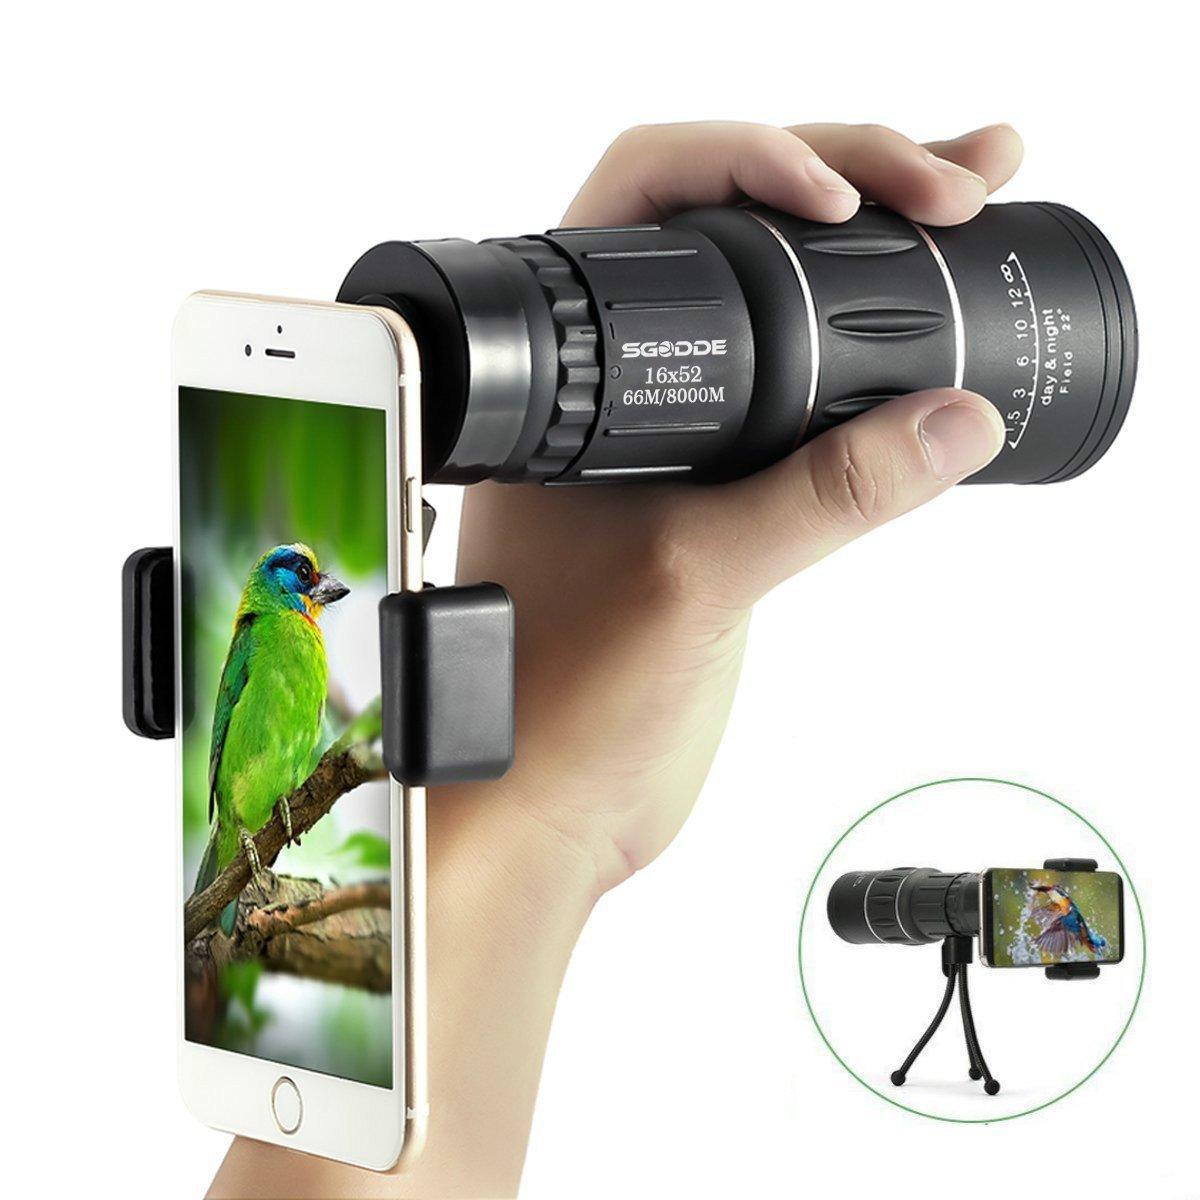 Super Clear 16x52 Monocular Telescope,SGODDE HD Monocular, Dual Focus Optics Zoom Portable Monocular for BirdWatching, Traveling, Outdoors, SightSeeing, sport watching,Climbing(Phone Adapter and Tripod)